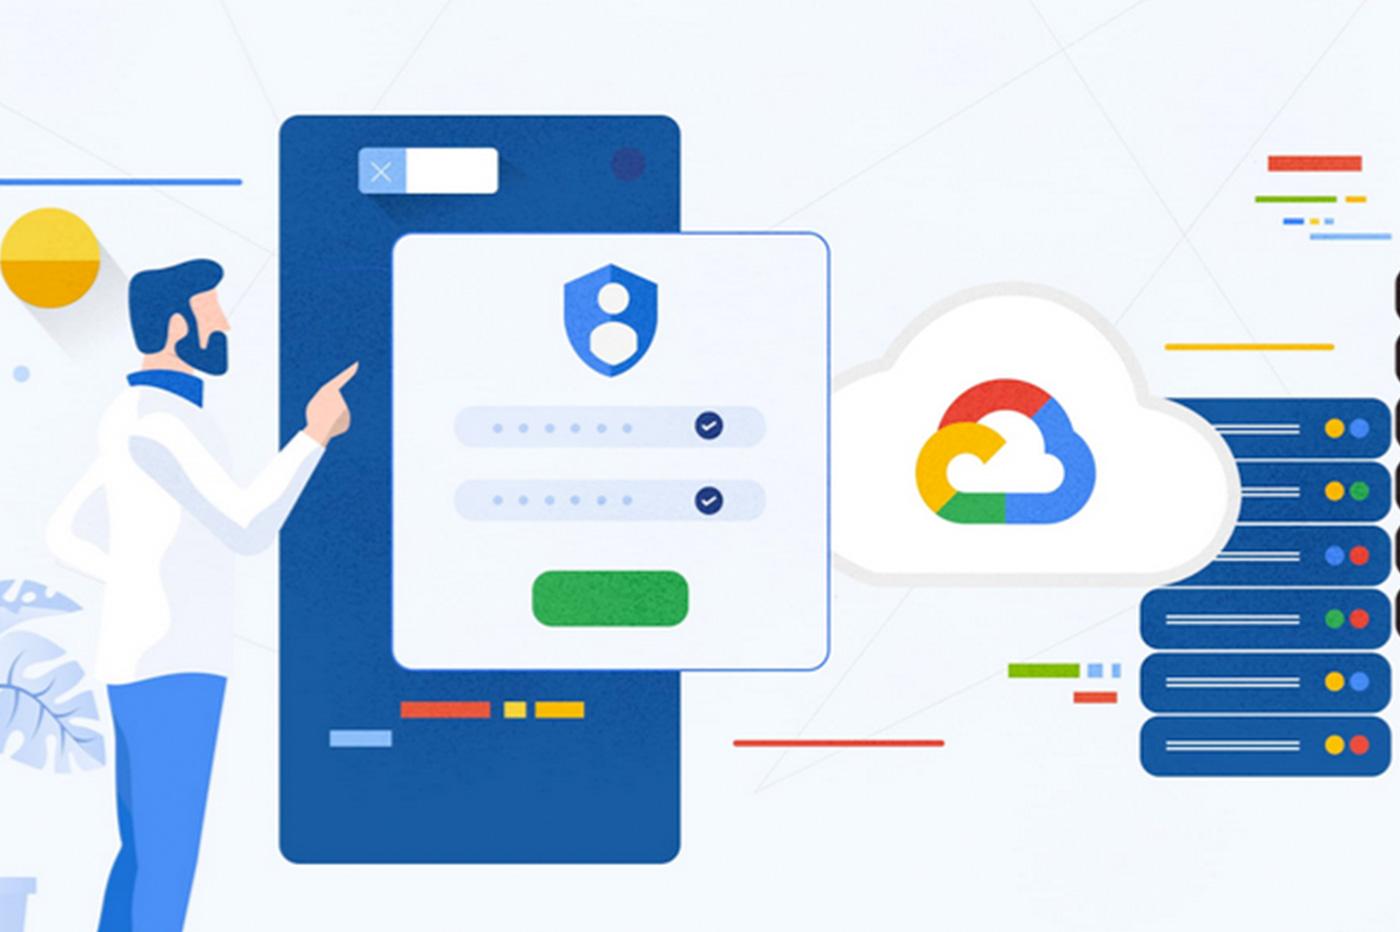 Google BeyondCorp Remote Access